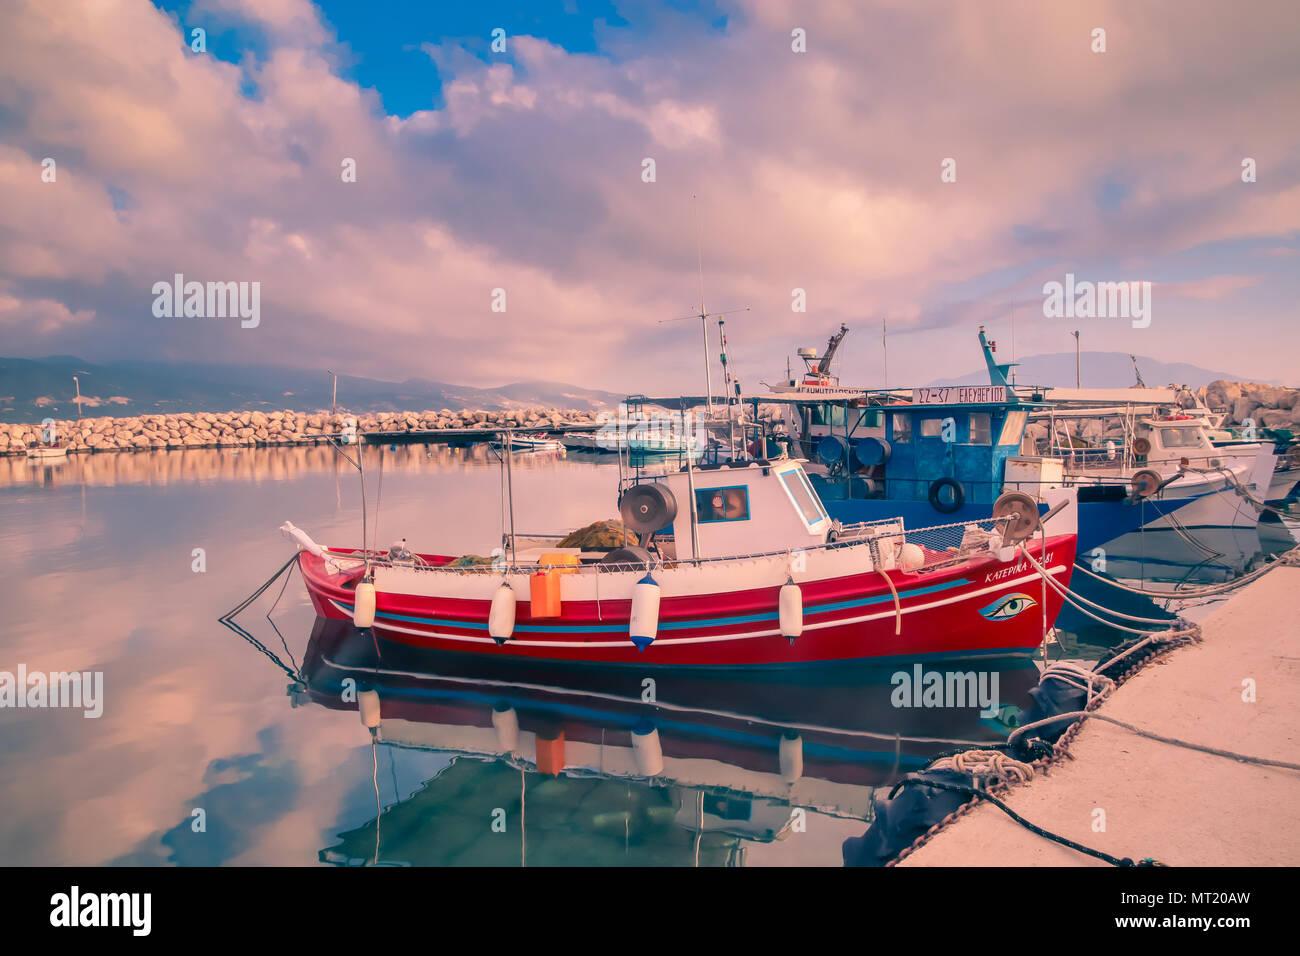 Small Fishing Boat / Vessel in Alykanas Boatyard at Sunrise, Dramatic colouring applied. Zante (Zakynthos) Greek Ionian Islands - Stock Image